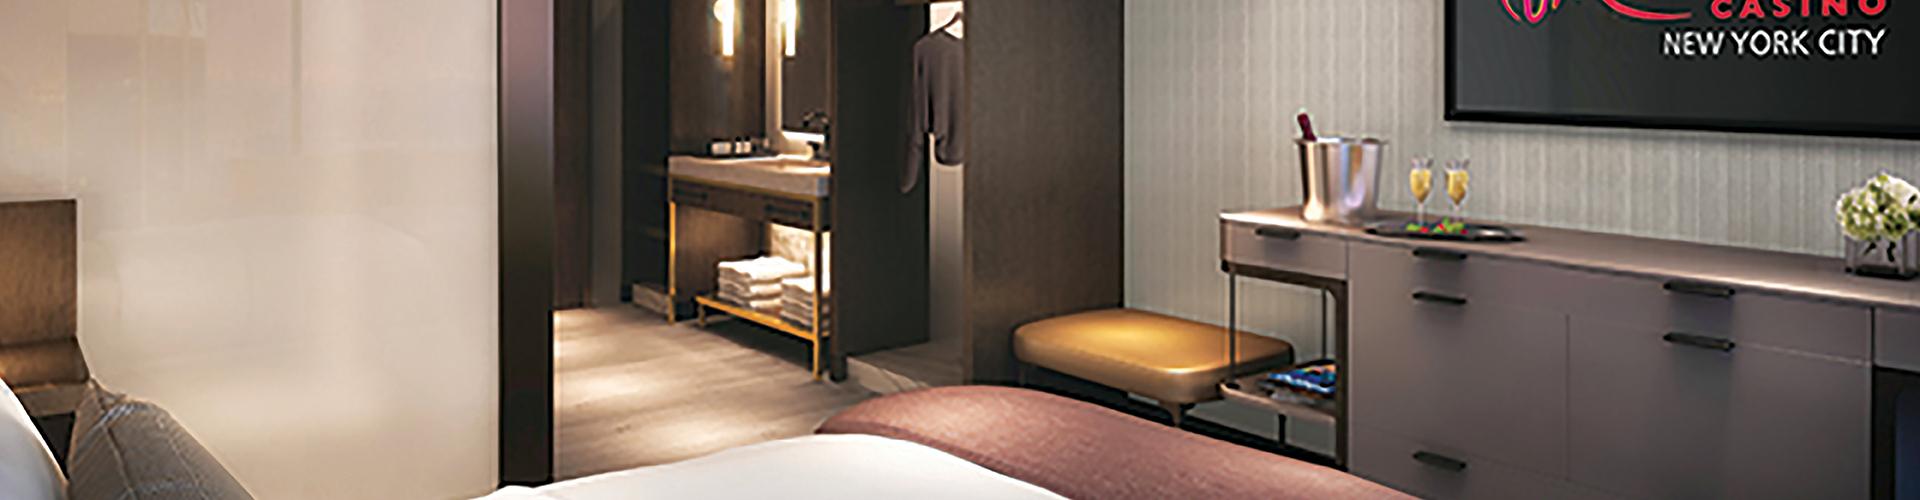 Resorts World NYC King Room